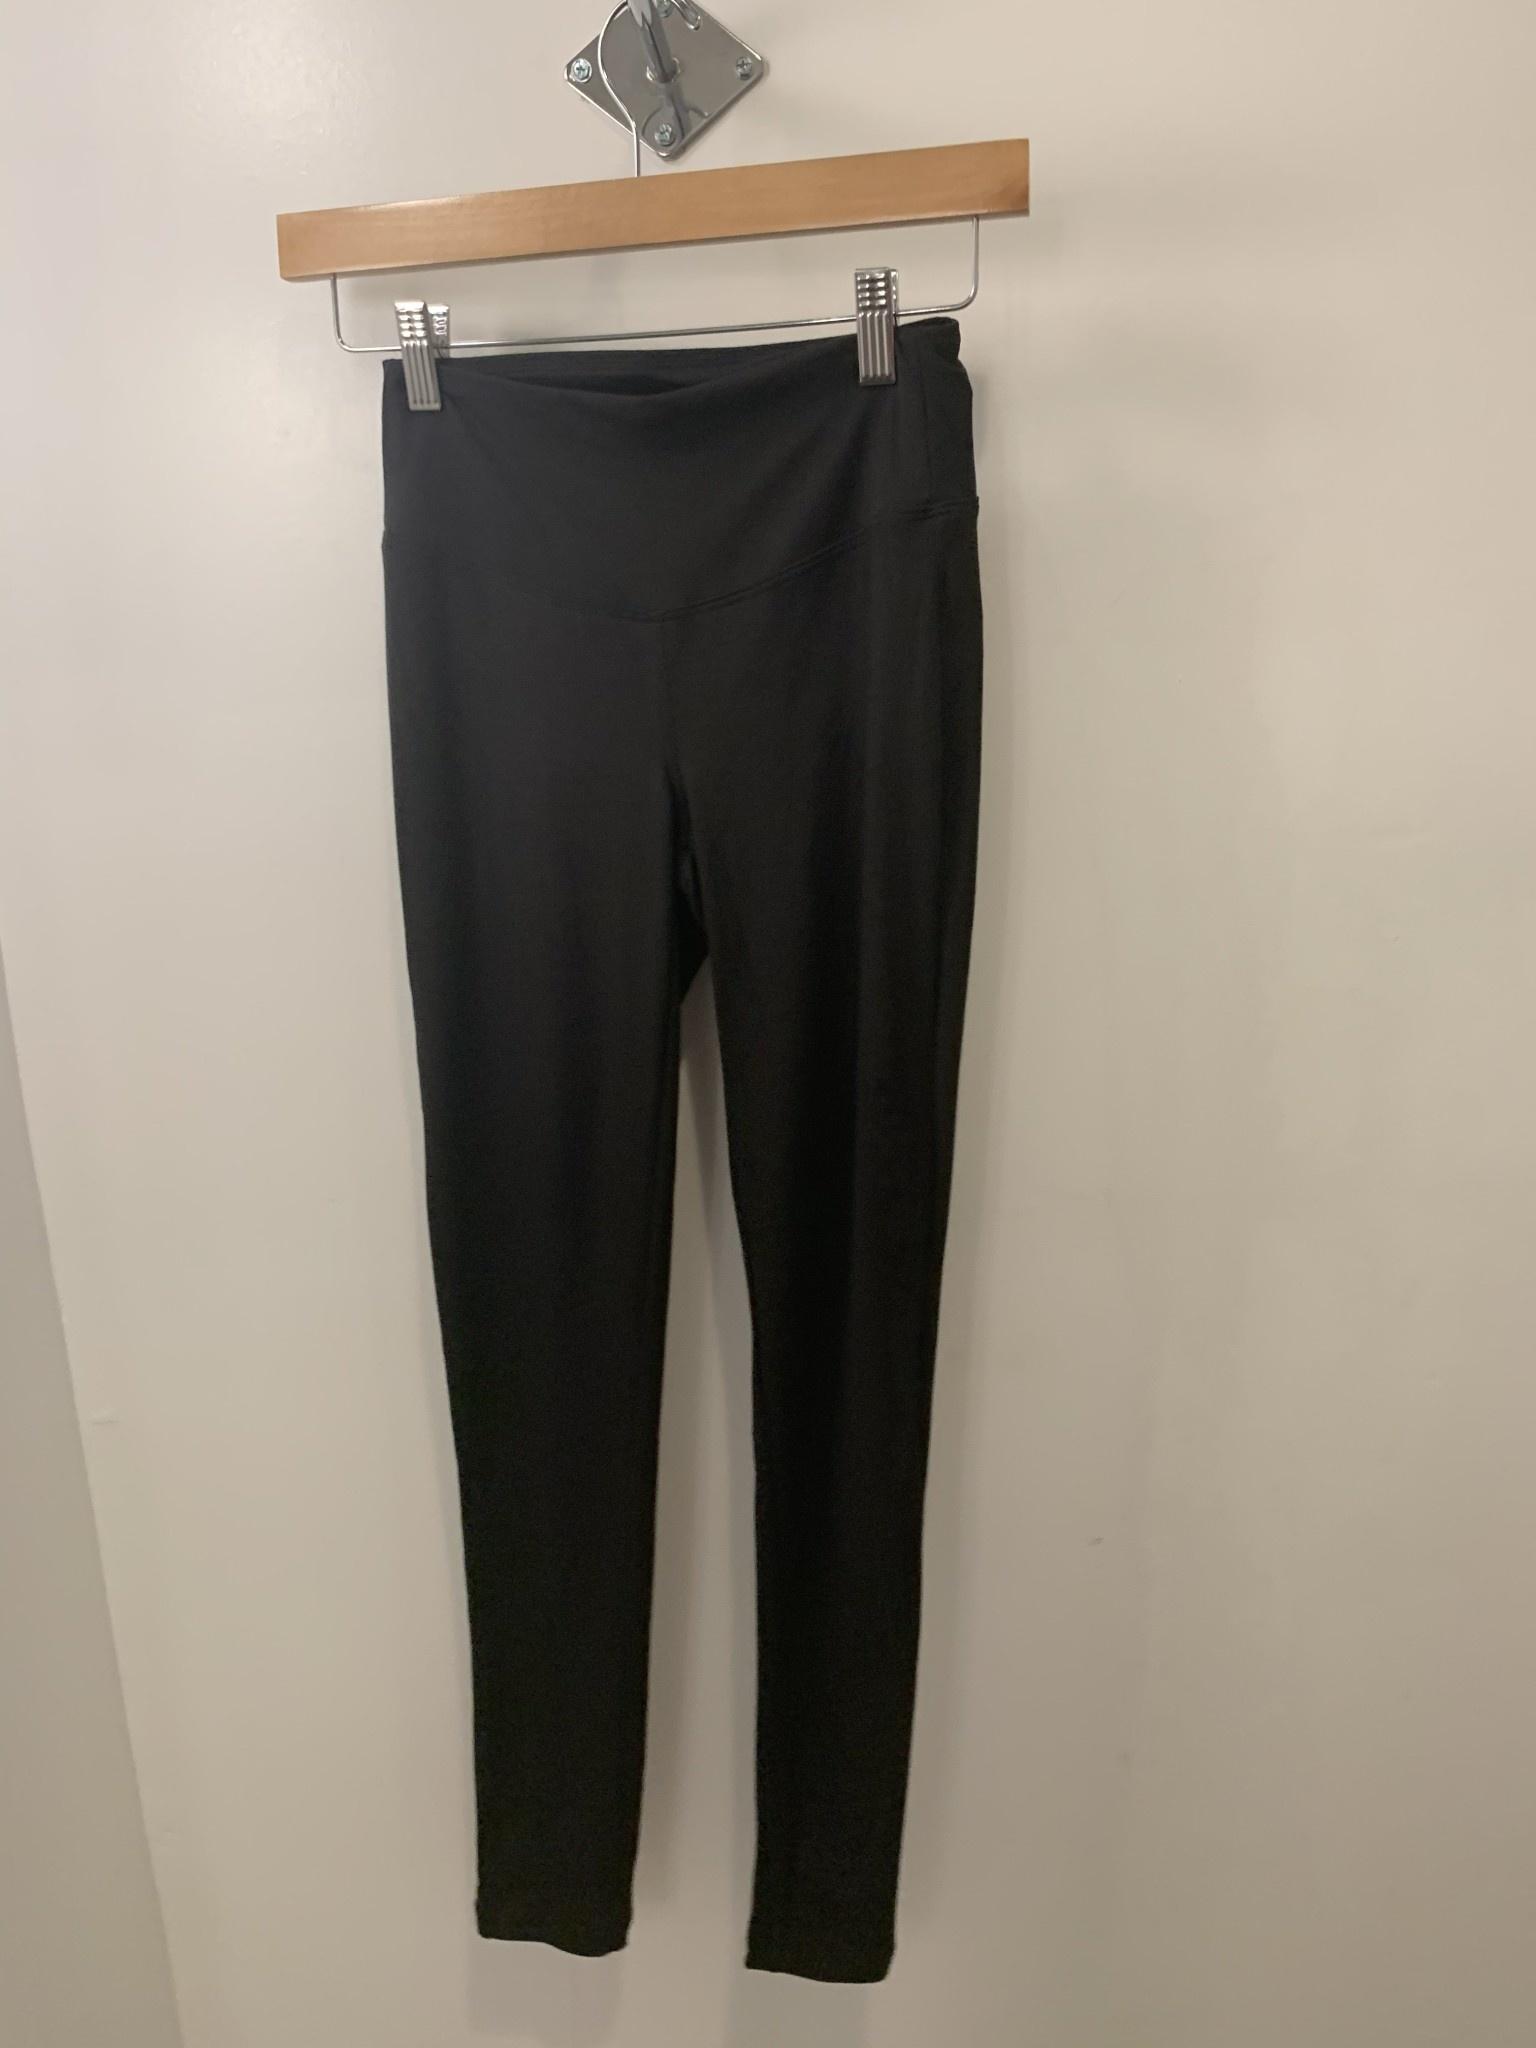 Wide Waistband Leggings in Black